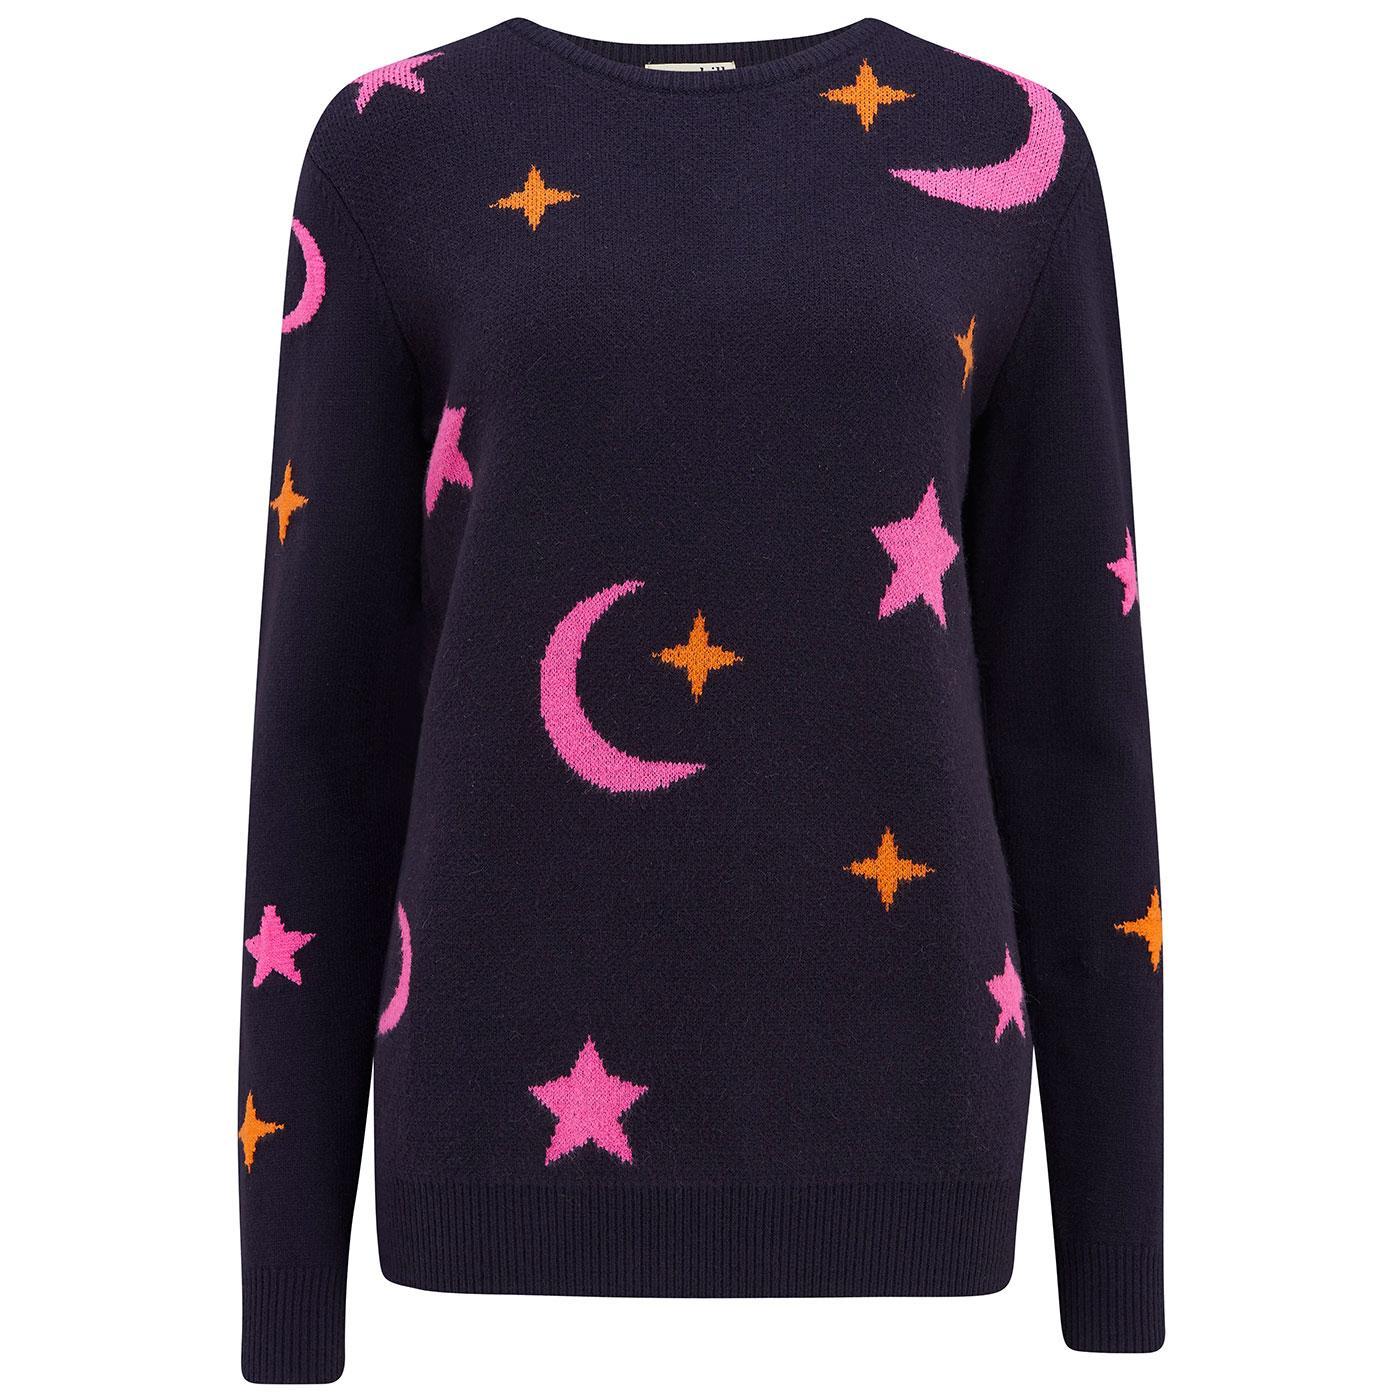 Stacey SUGARHILL BRIGHTON Stars & Moons Jumper